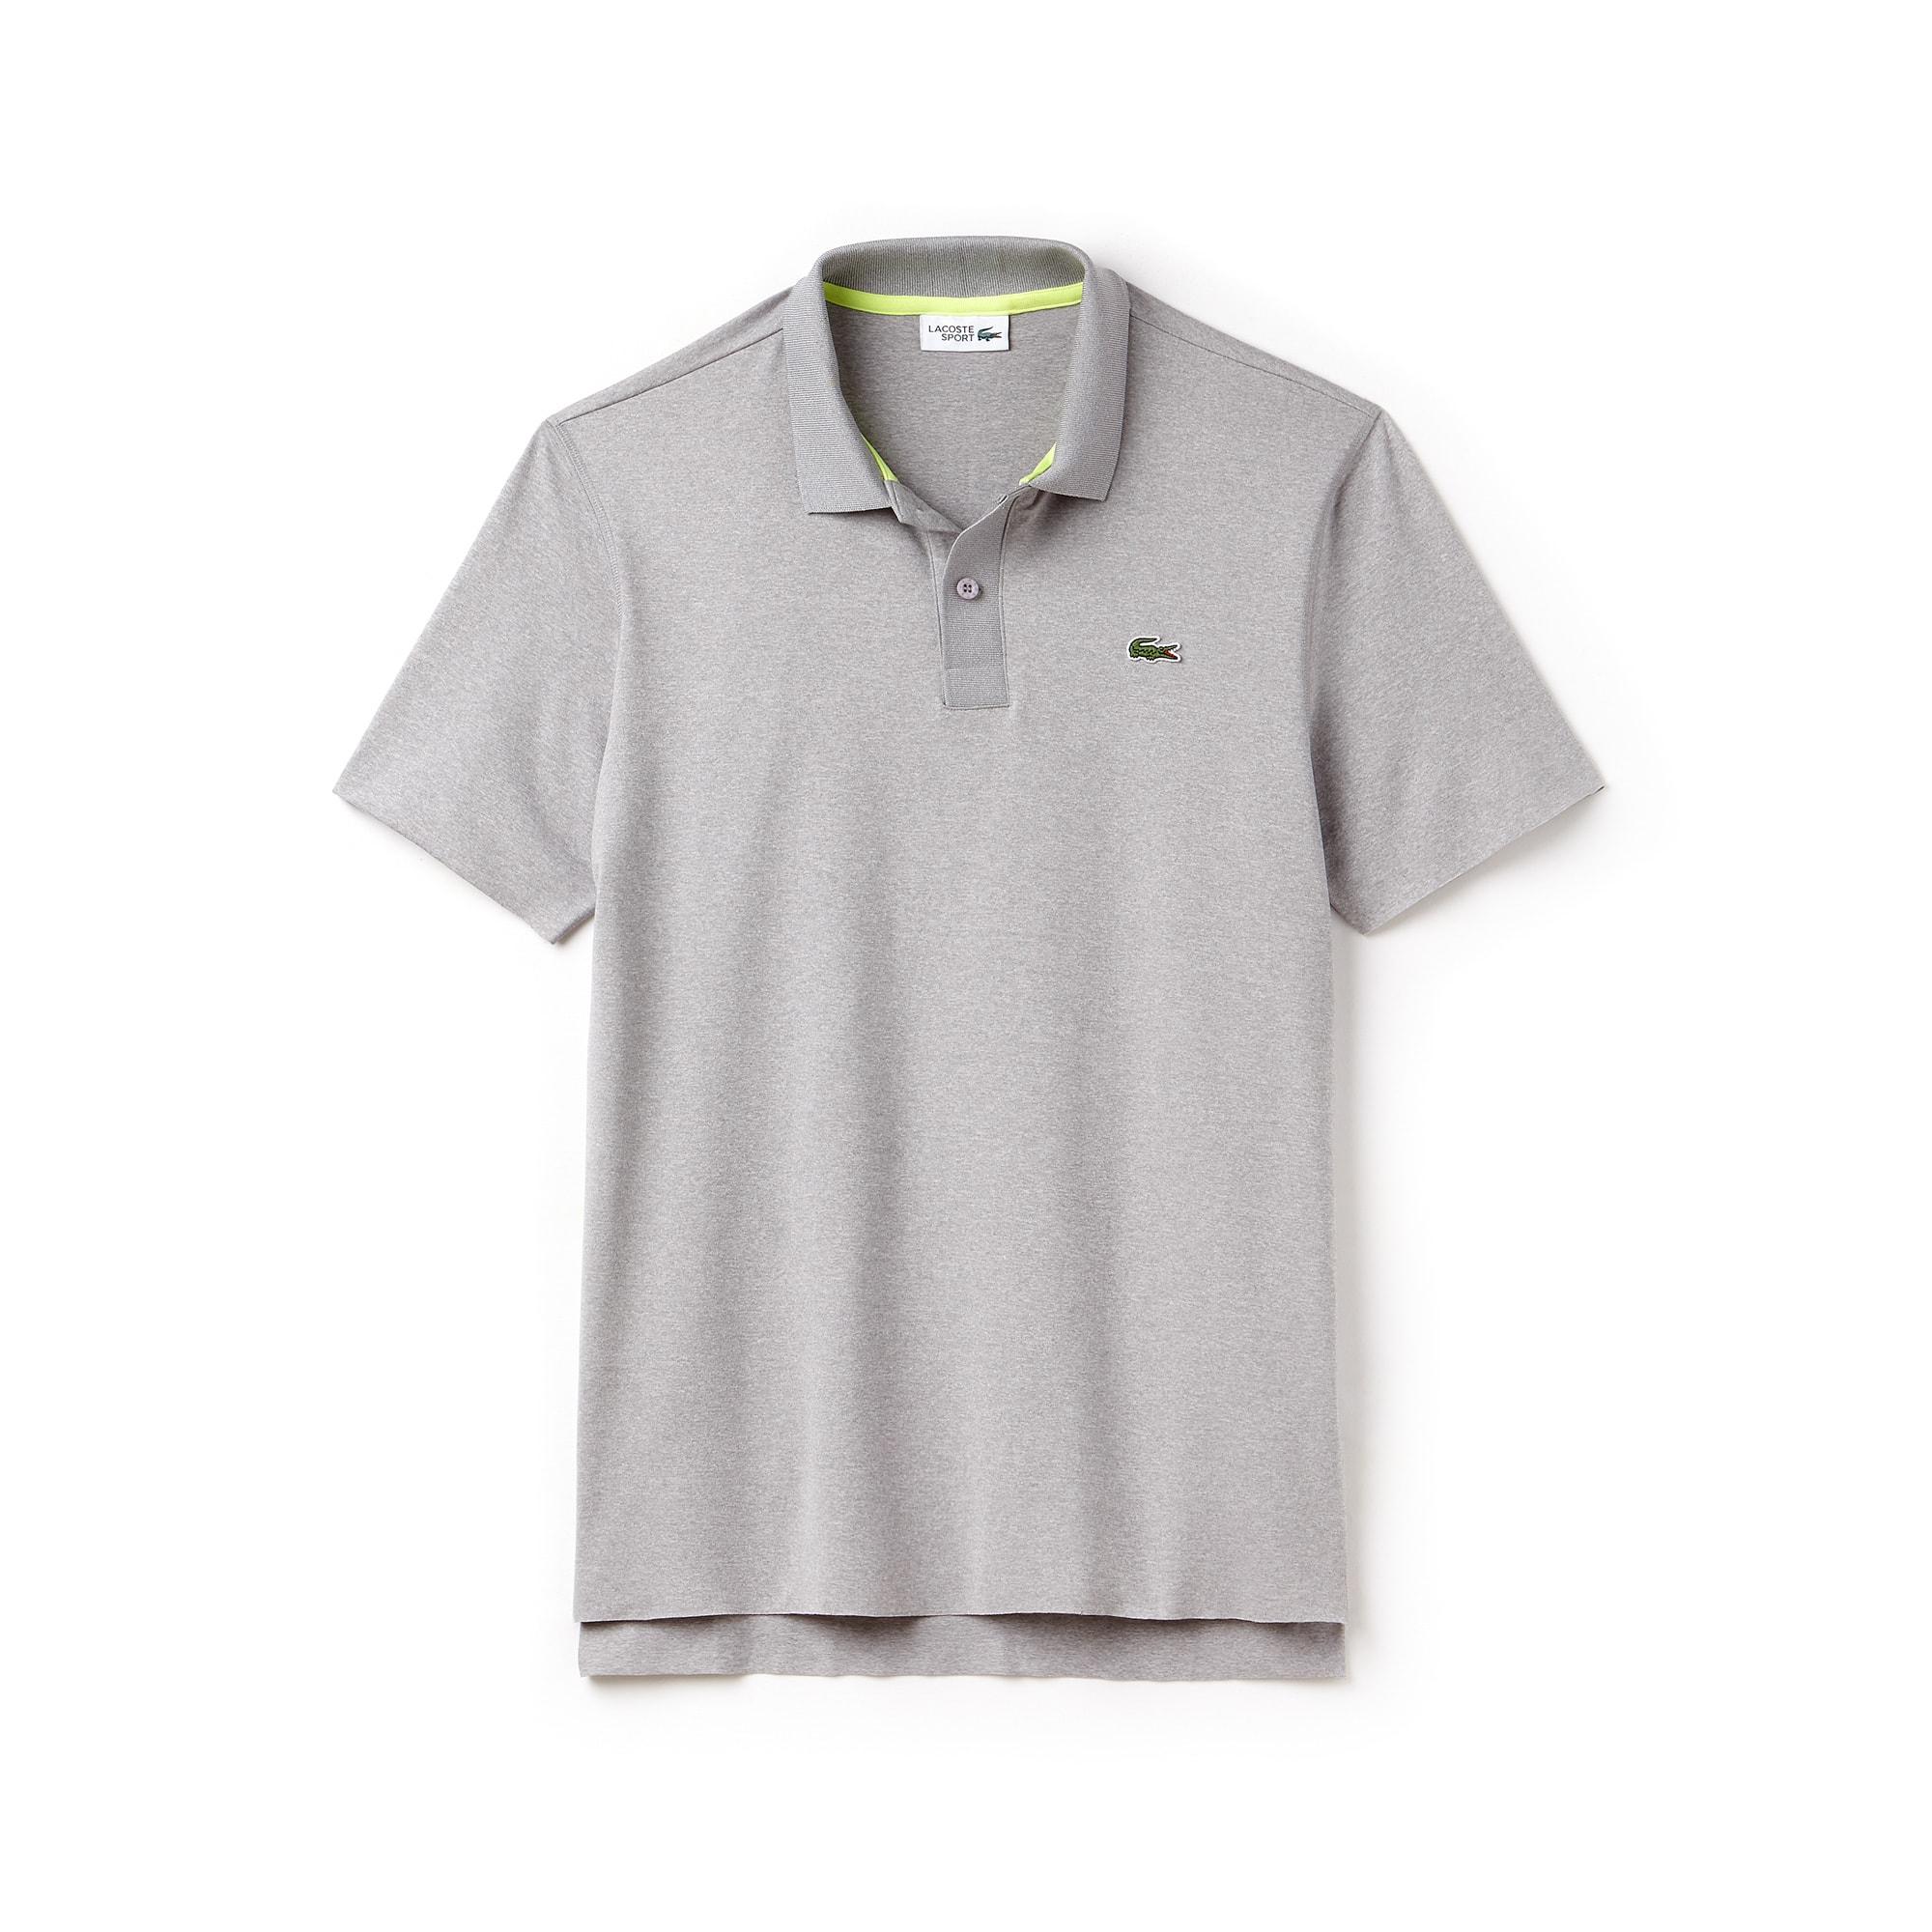 Men's Lacoste SPORT Flecked Stretch Jersey Tennis Polo